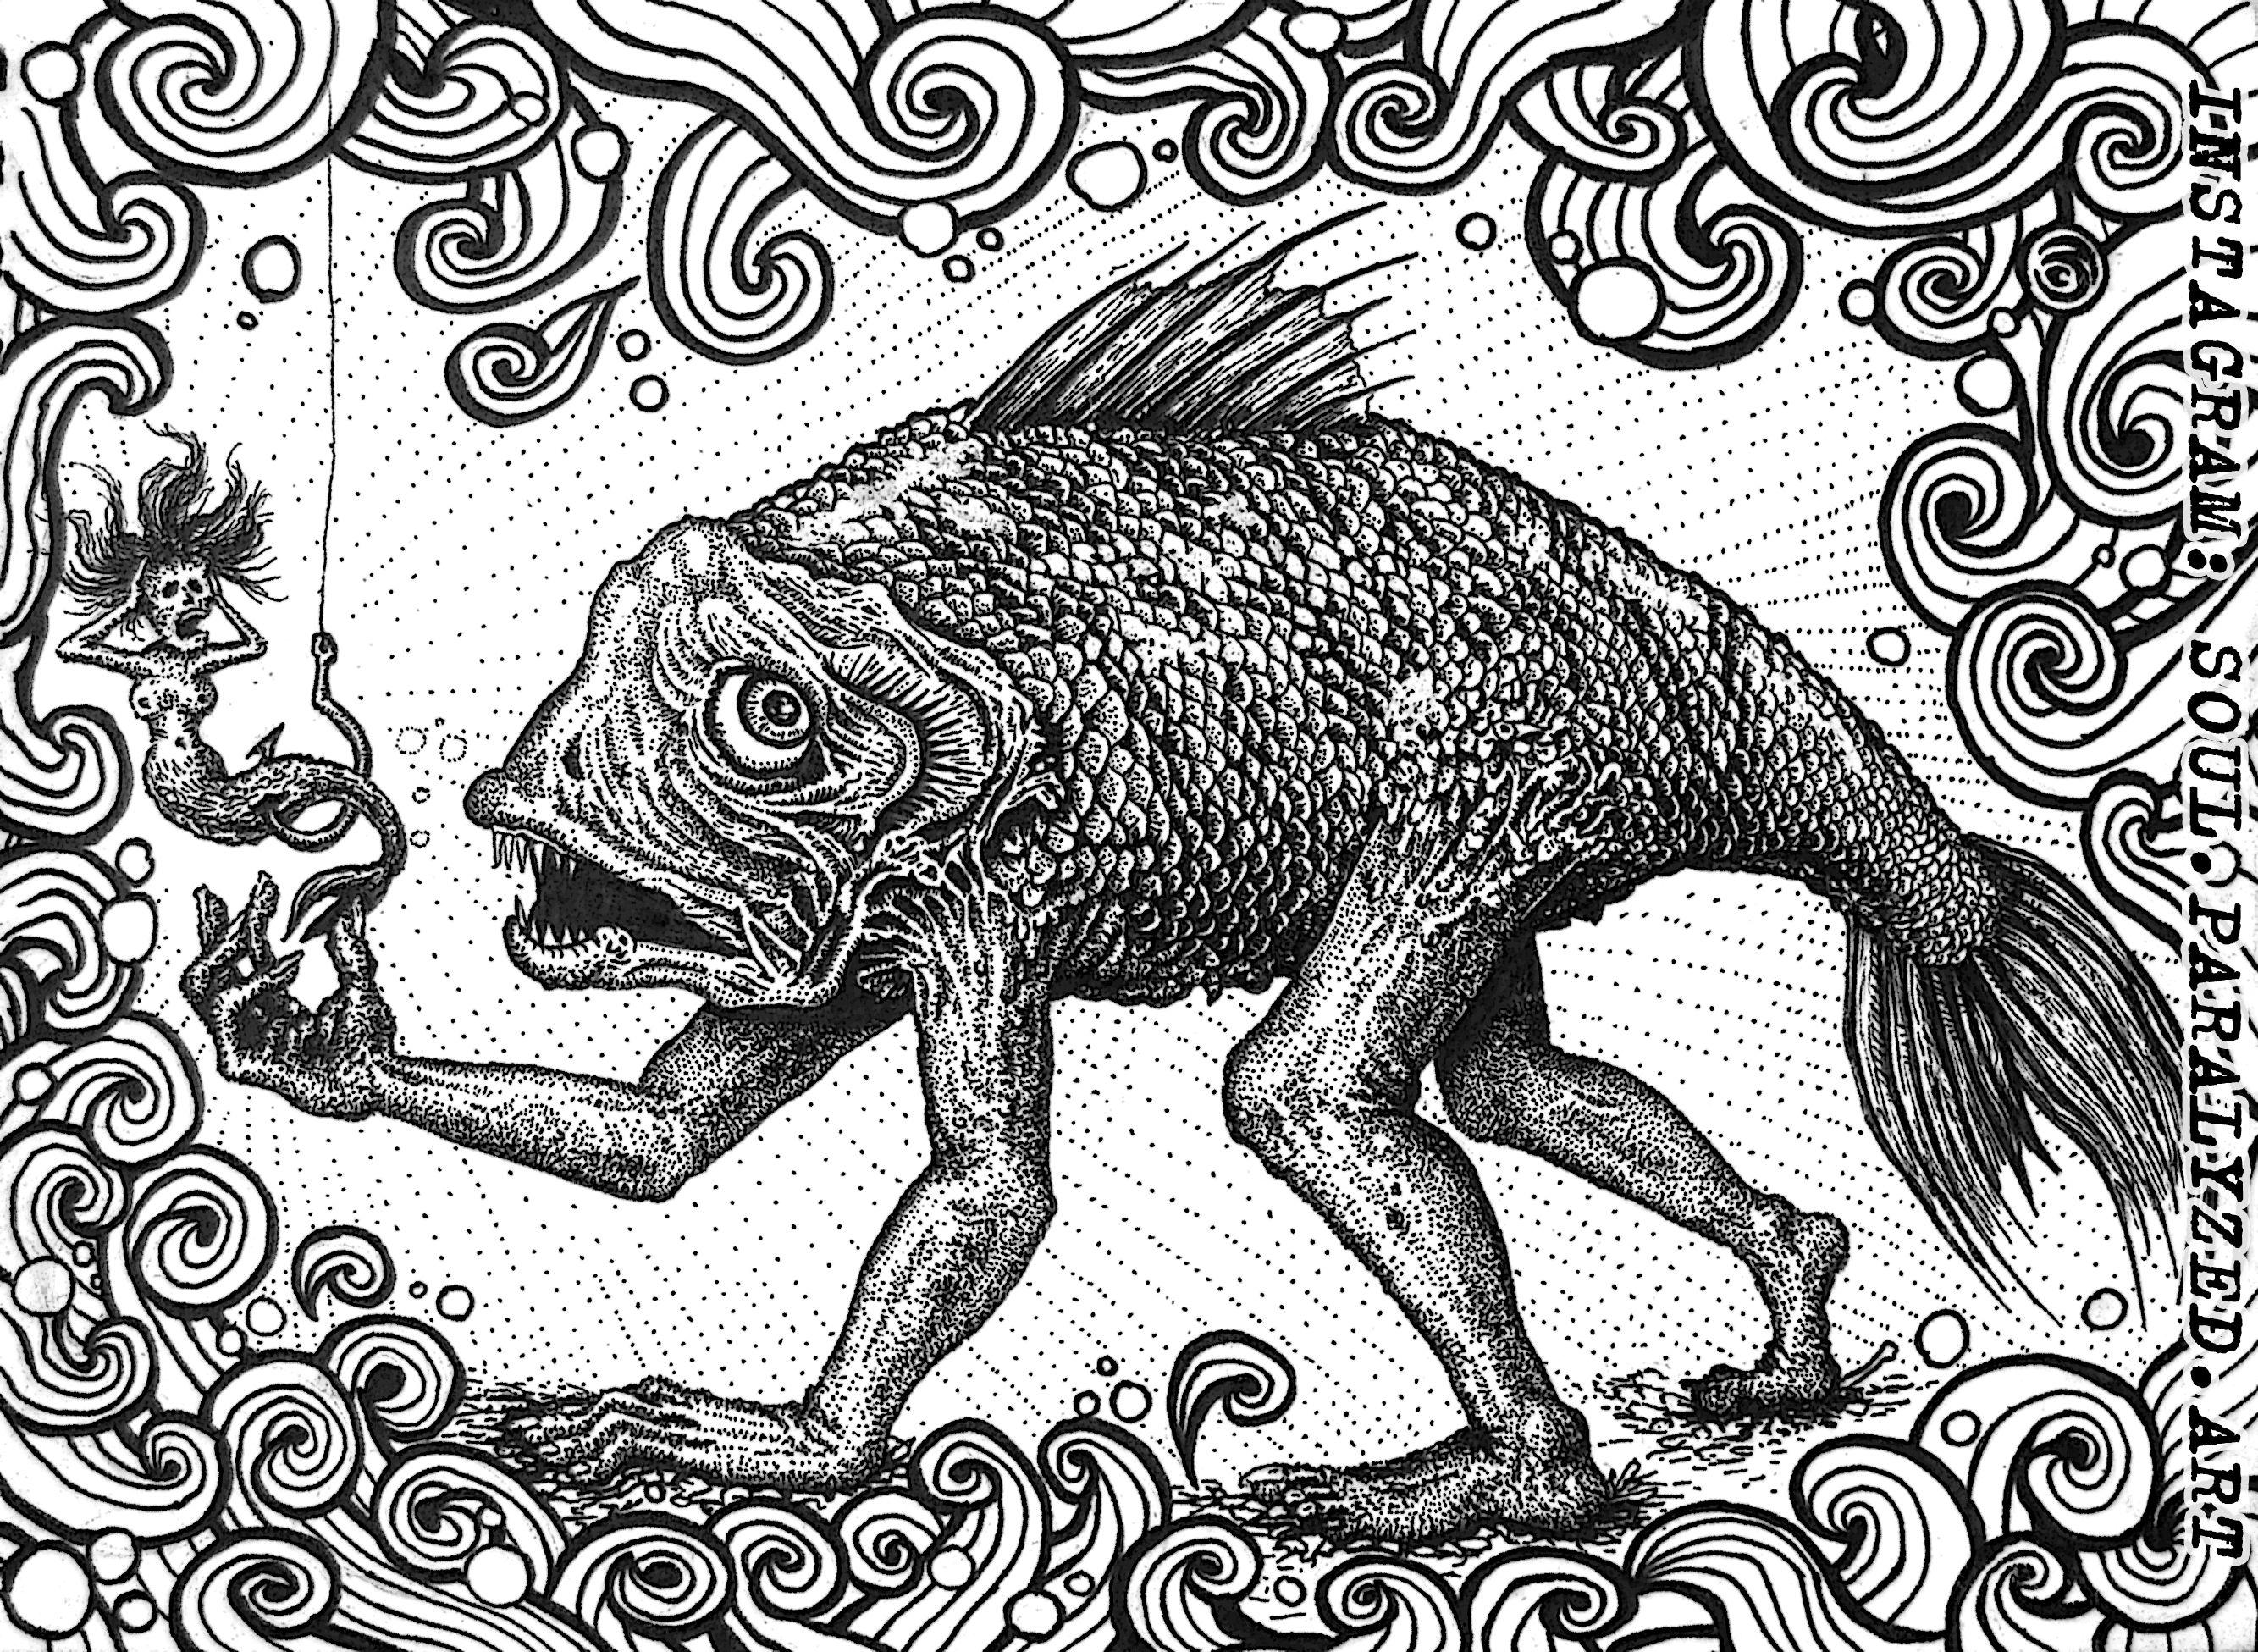 #soulparalyzed #fish #creepy #sergeizolotov #surreal #darksurrealism #lowbrowart